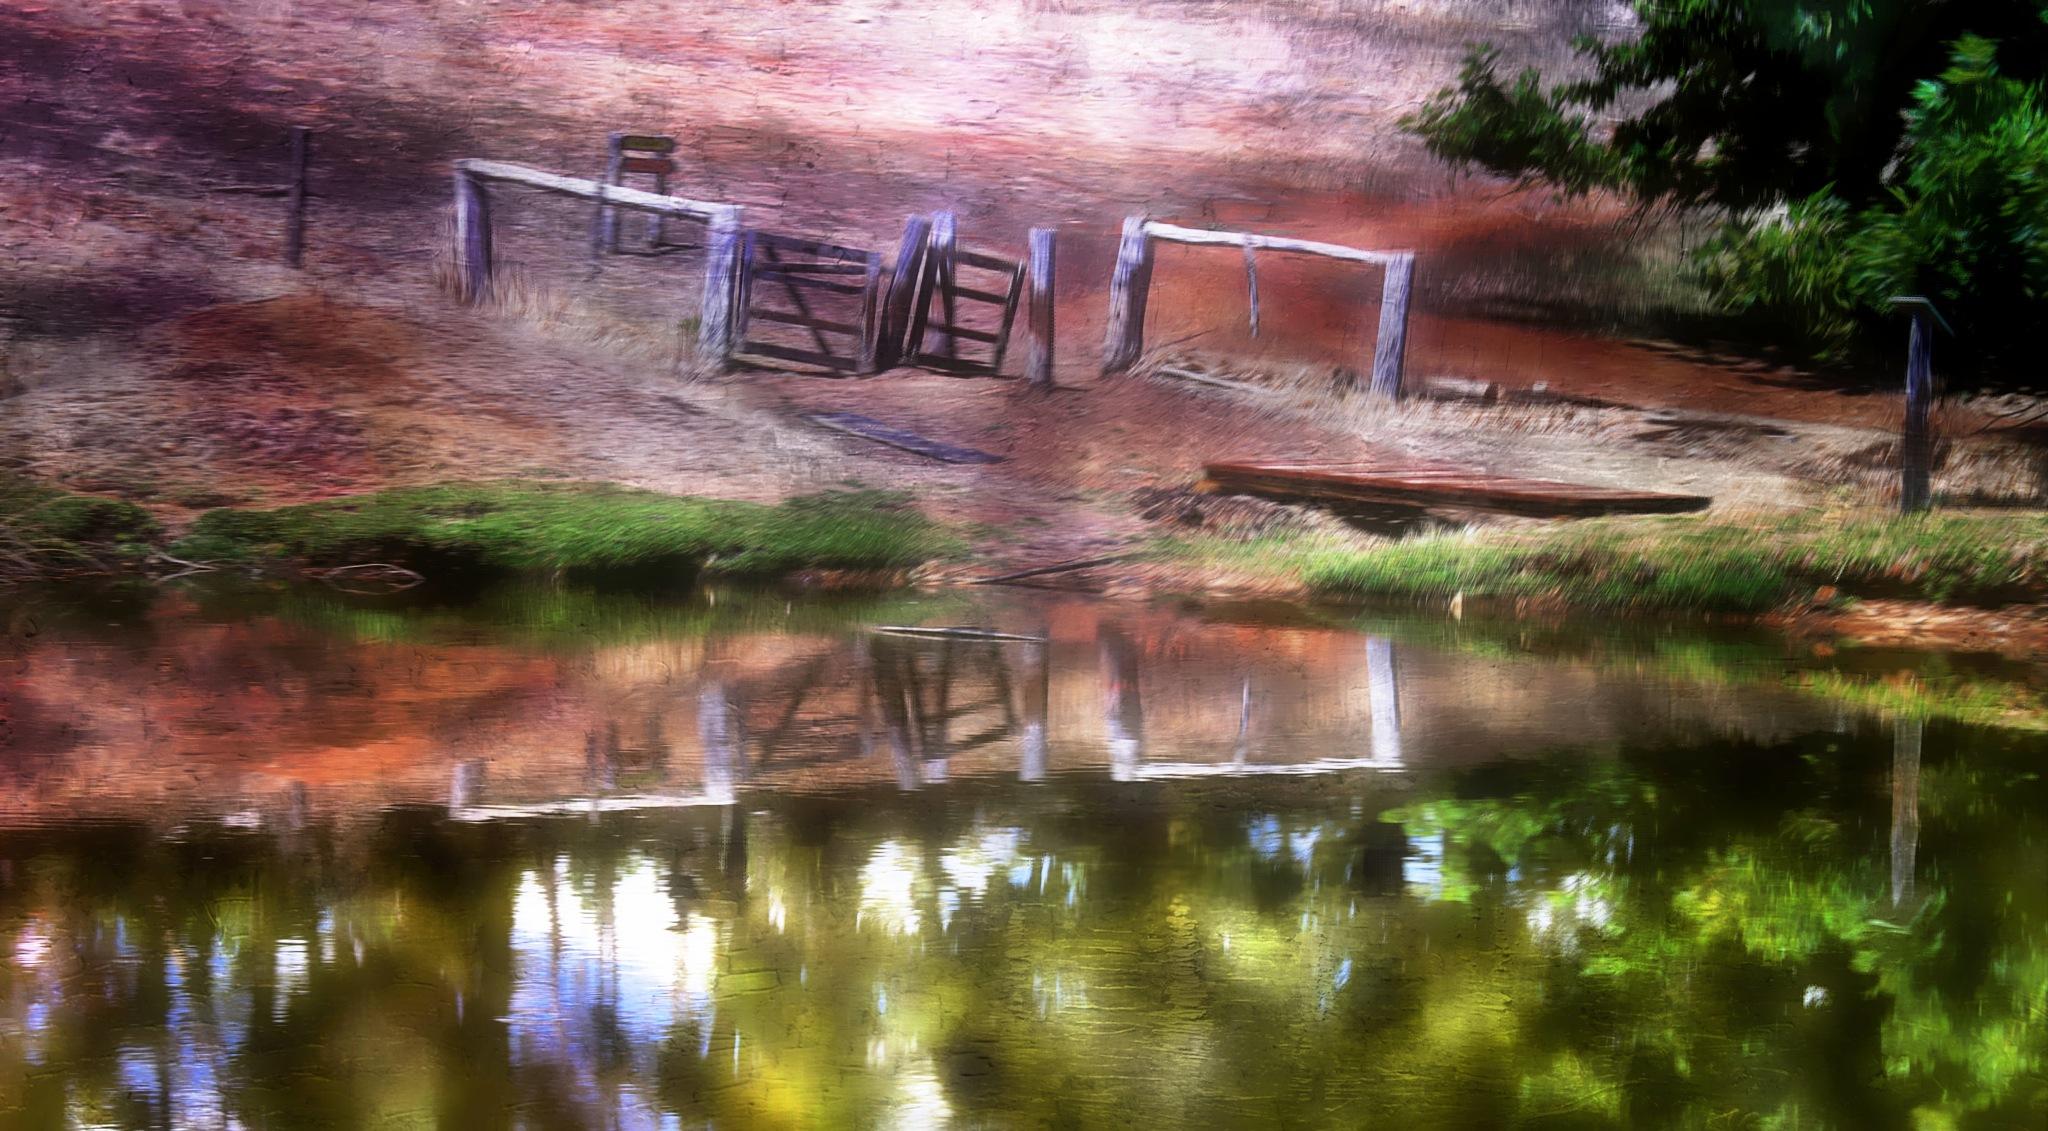 Rural  reflection  by LyndaRealmshift